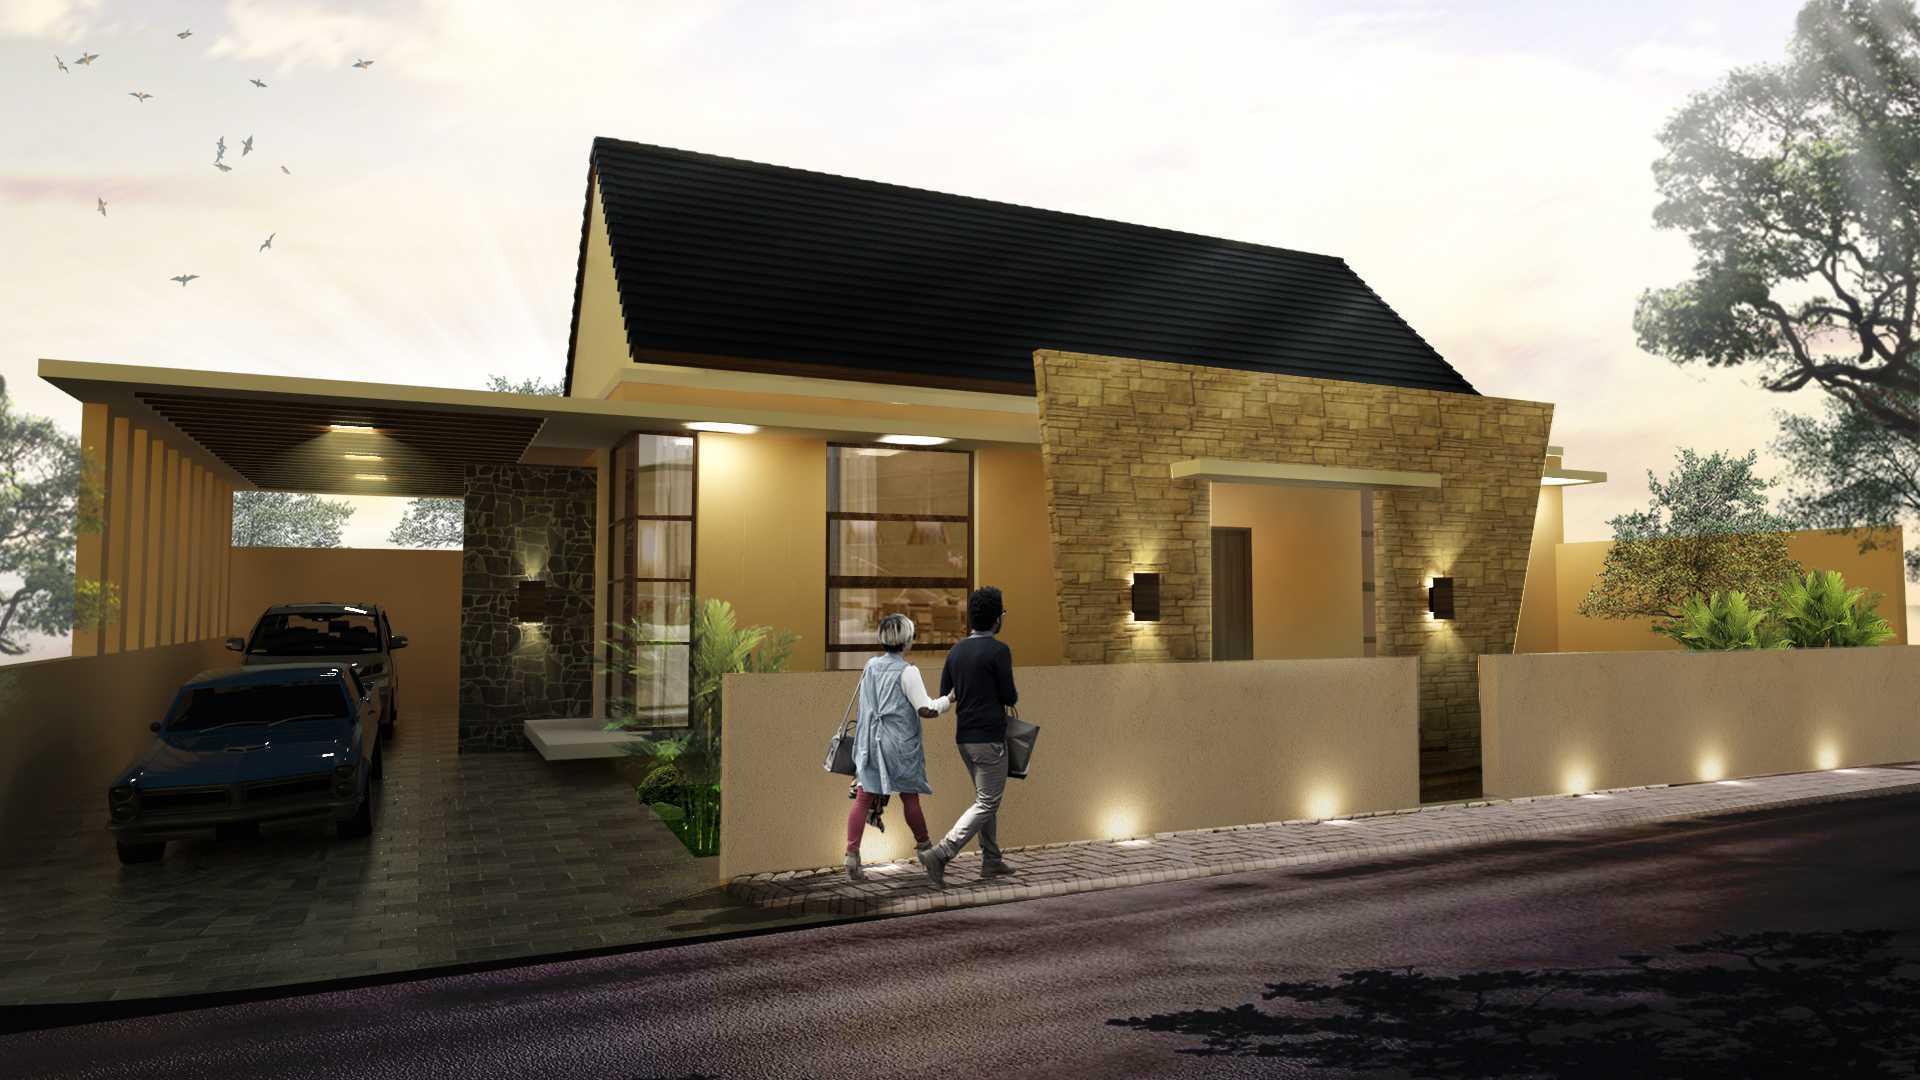 Rdesign Private House Rawalumbu Bekasi Jl. Lumbu Permai 1 No 78, Bekasi, Indonesia Jl. Lumbu Permai 1 No 78, Bekasi, Indonesia Front View Modern  19185